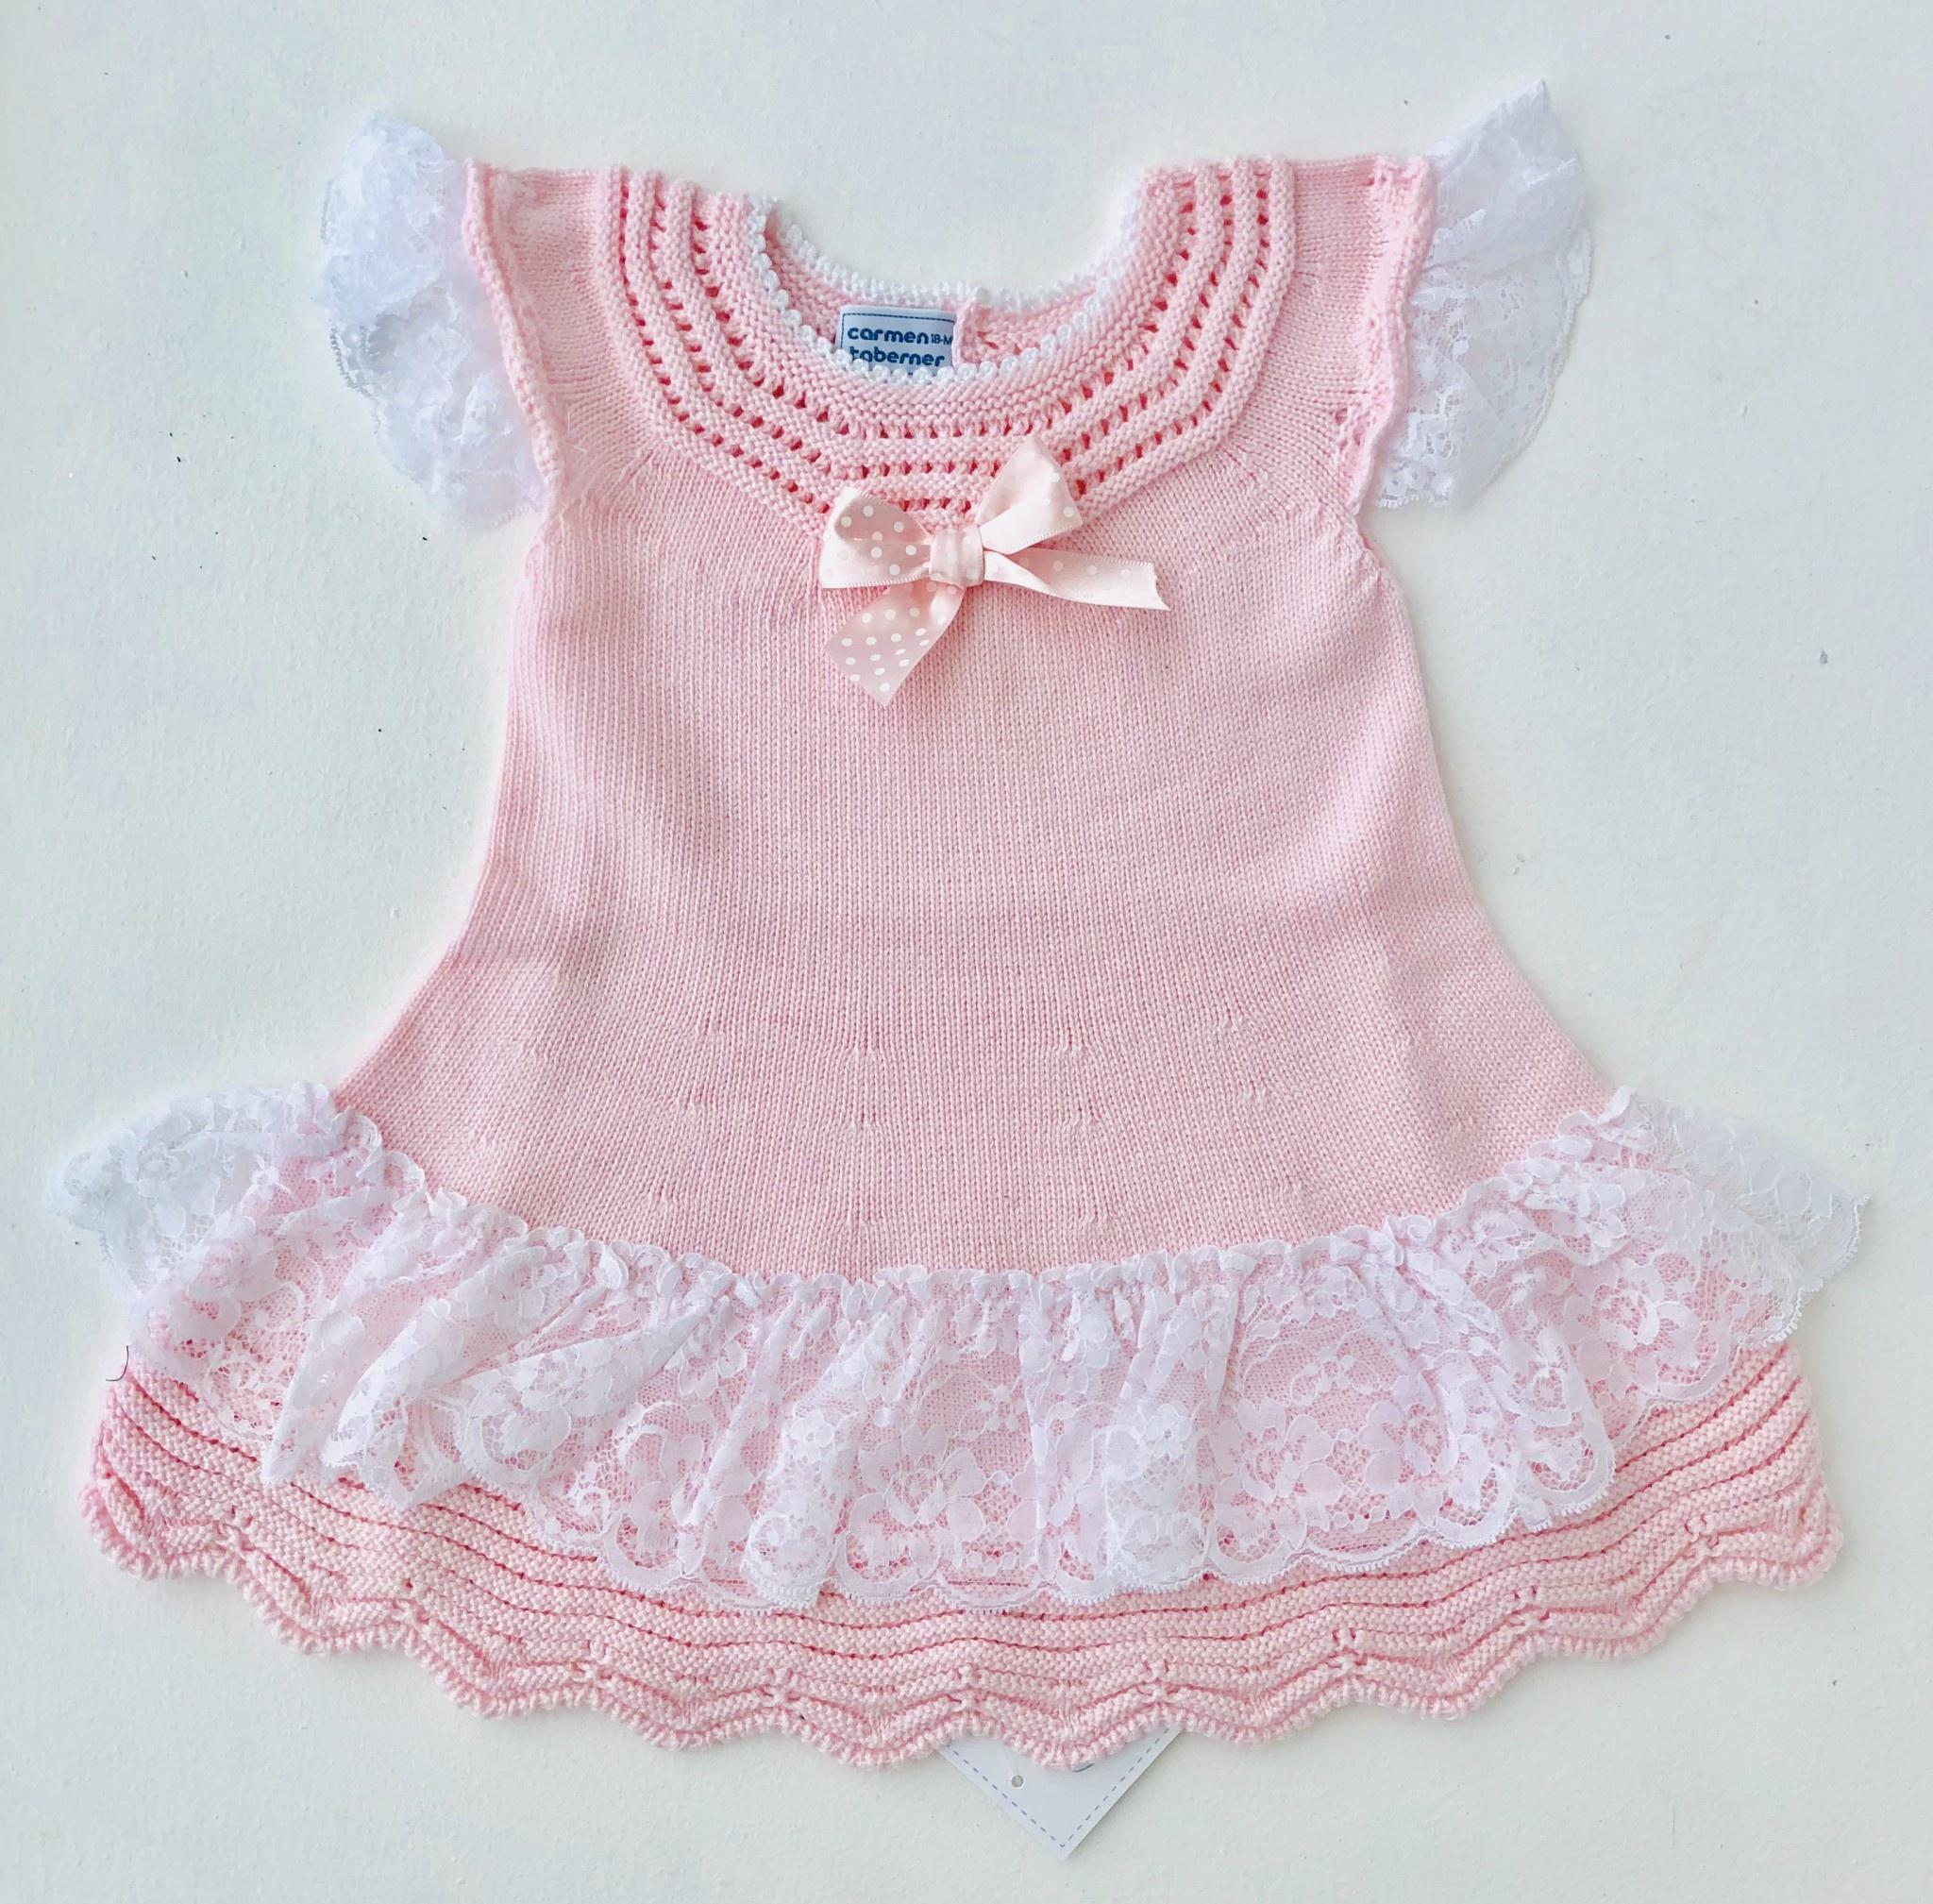 Carmen Taberner Carmen Taberner Pink Knit Dress With Lace Frill